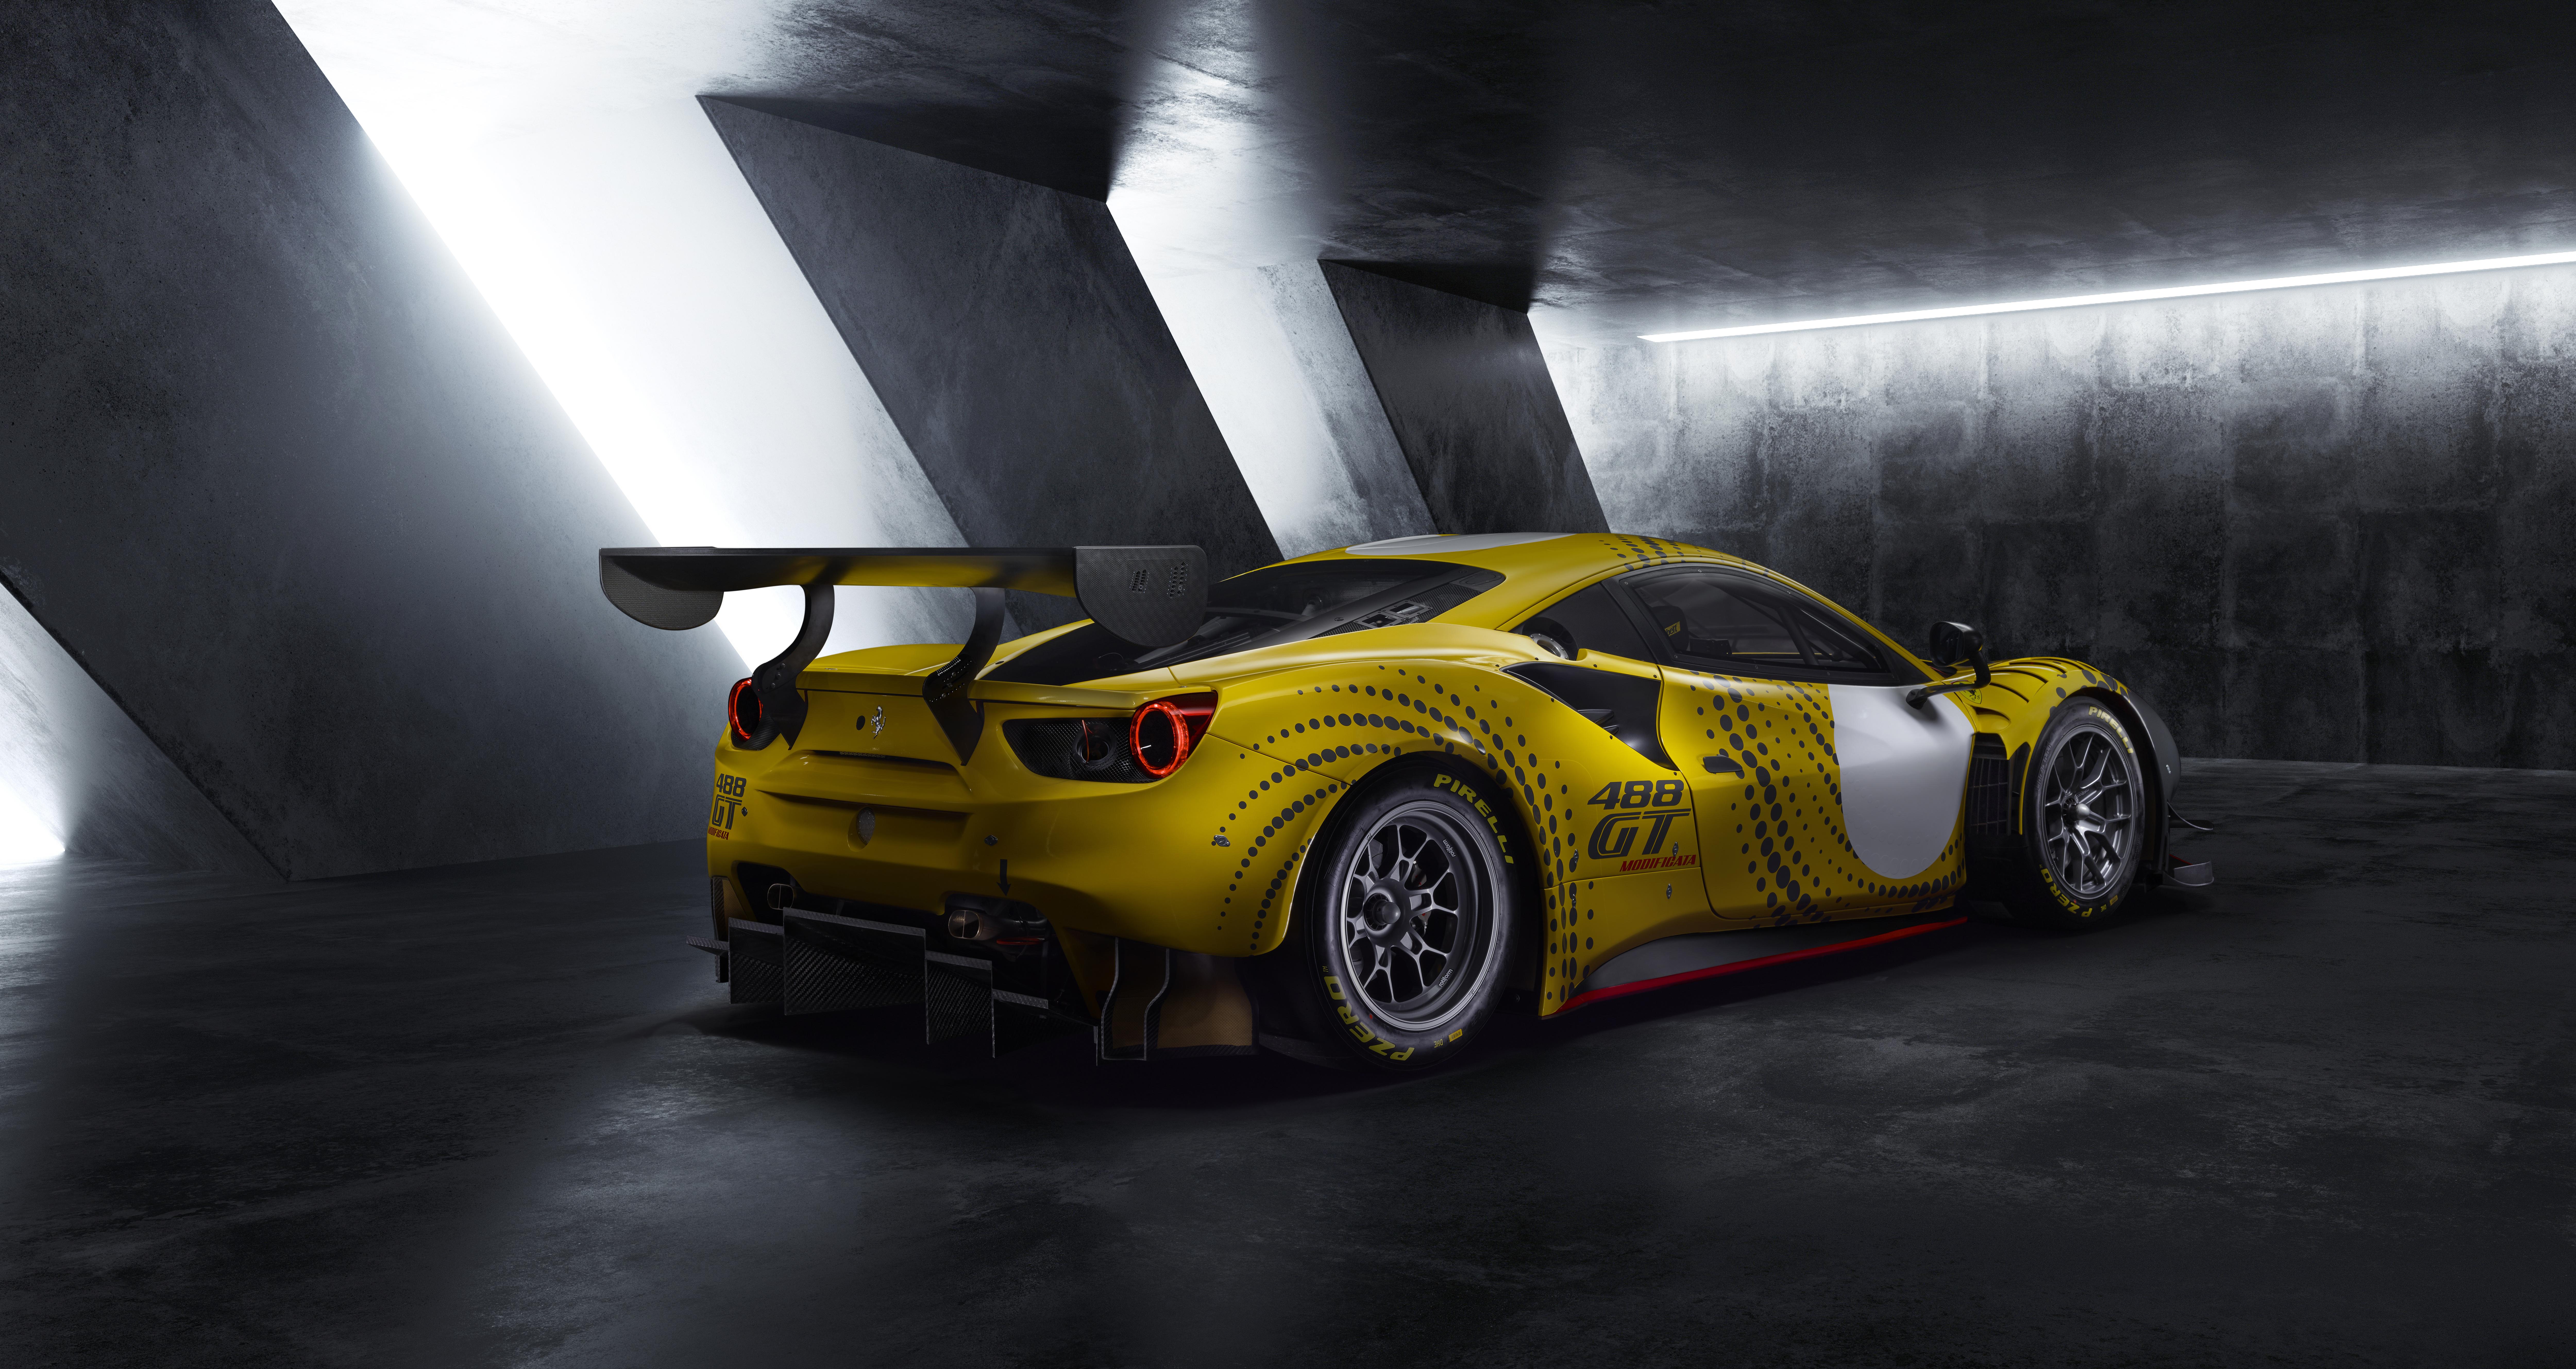 ferrari 488 gt modificata 2021 rear 4k 1608918577 - Ferrari 488 GT Modificata 2021 Rear 4k - Ferrari 488 GT Modificata 2021 Rear 4k wallpapers